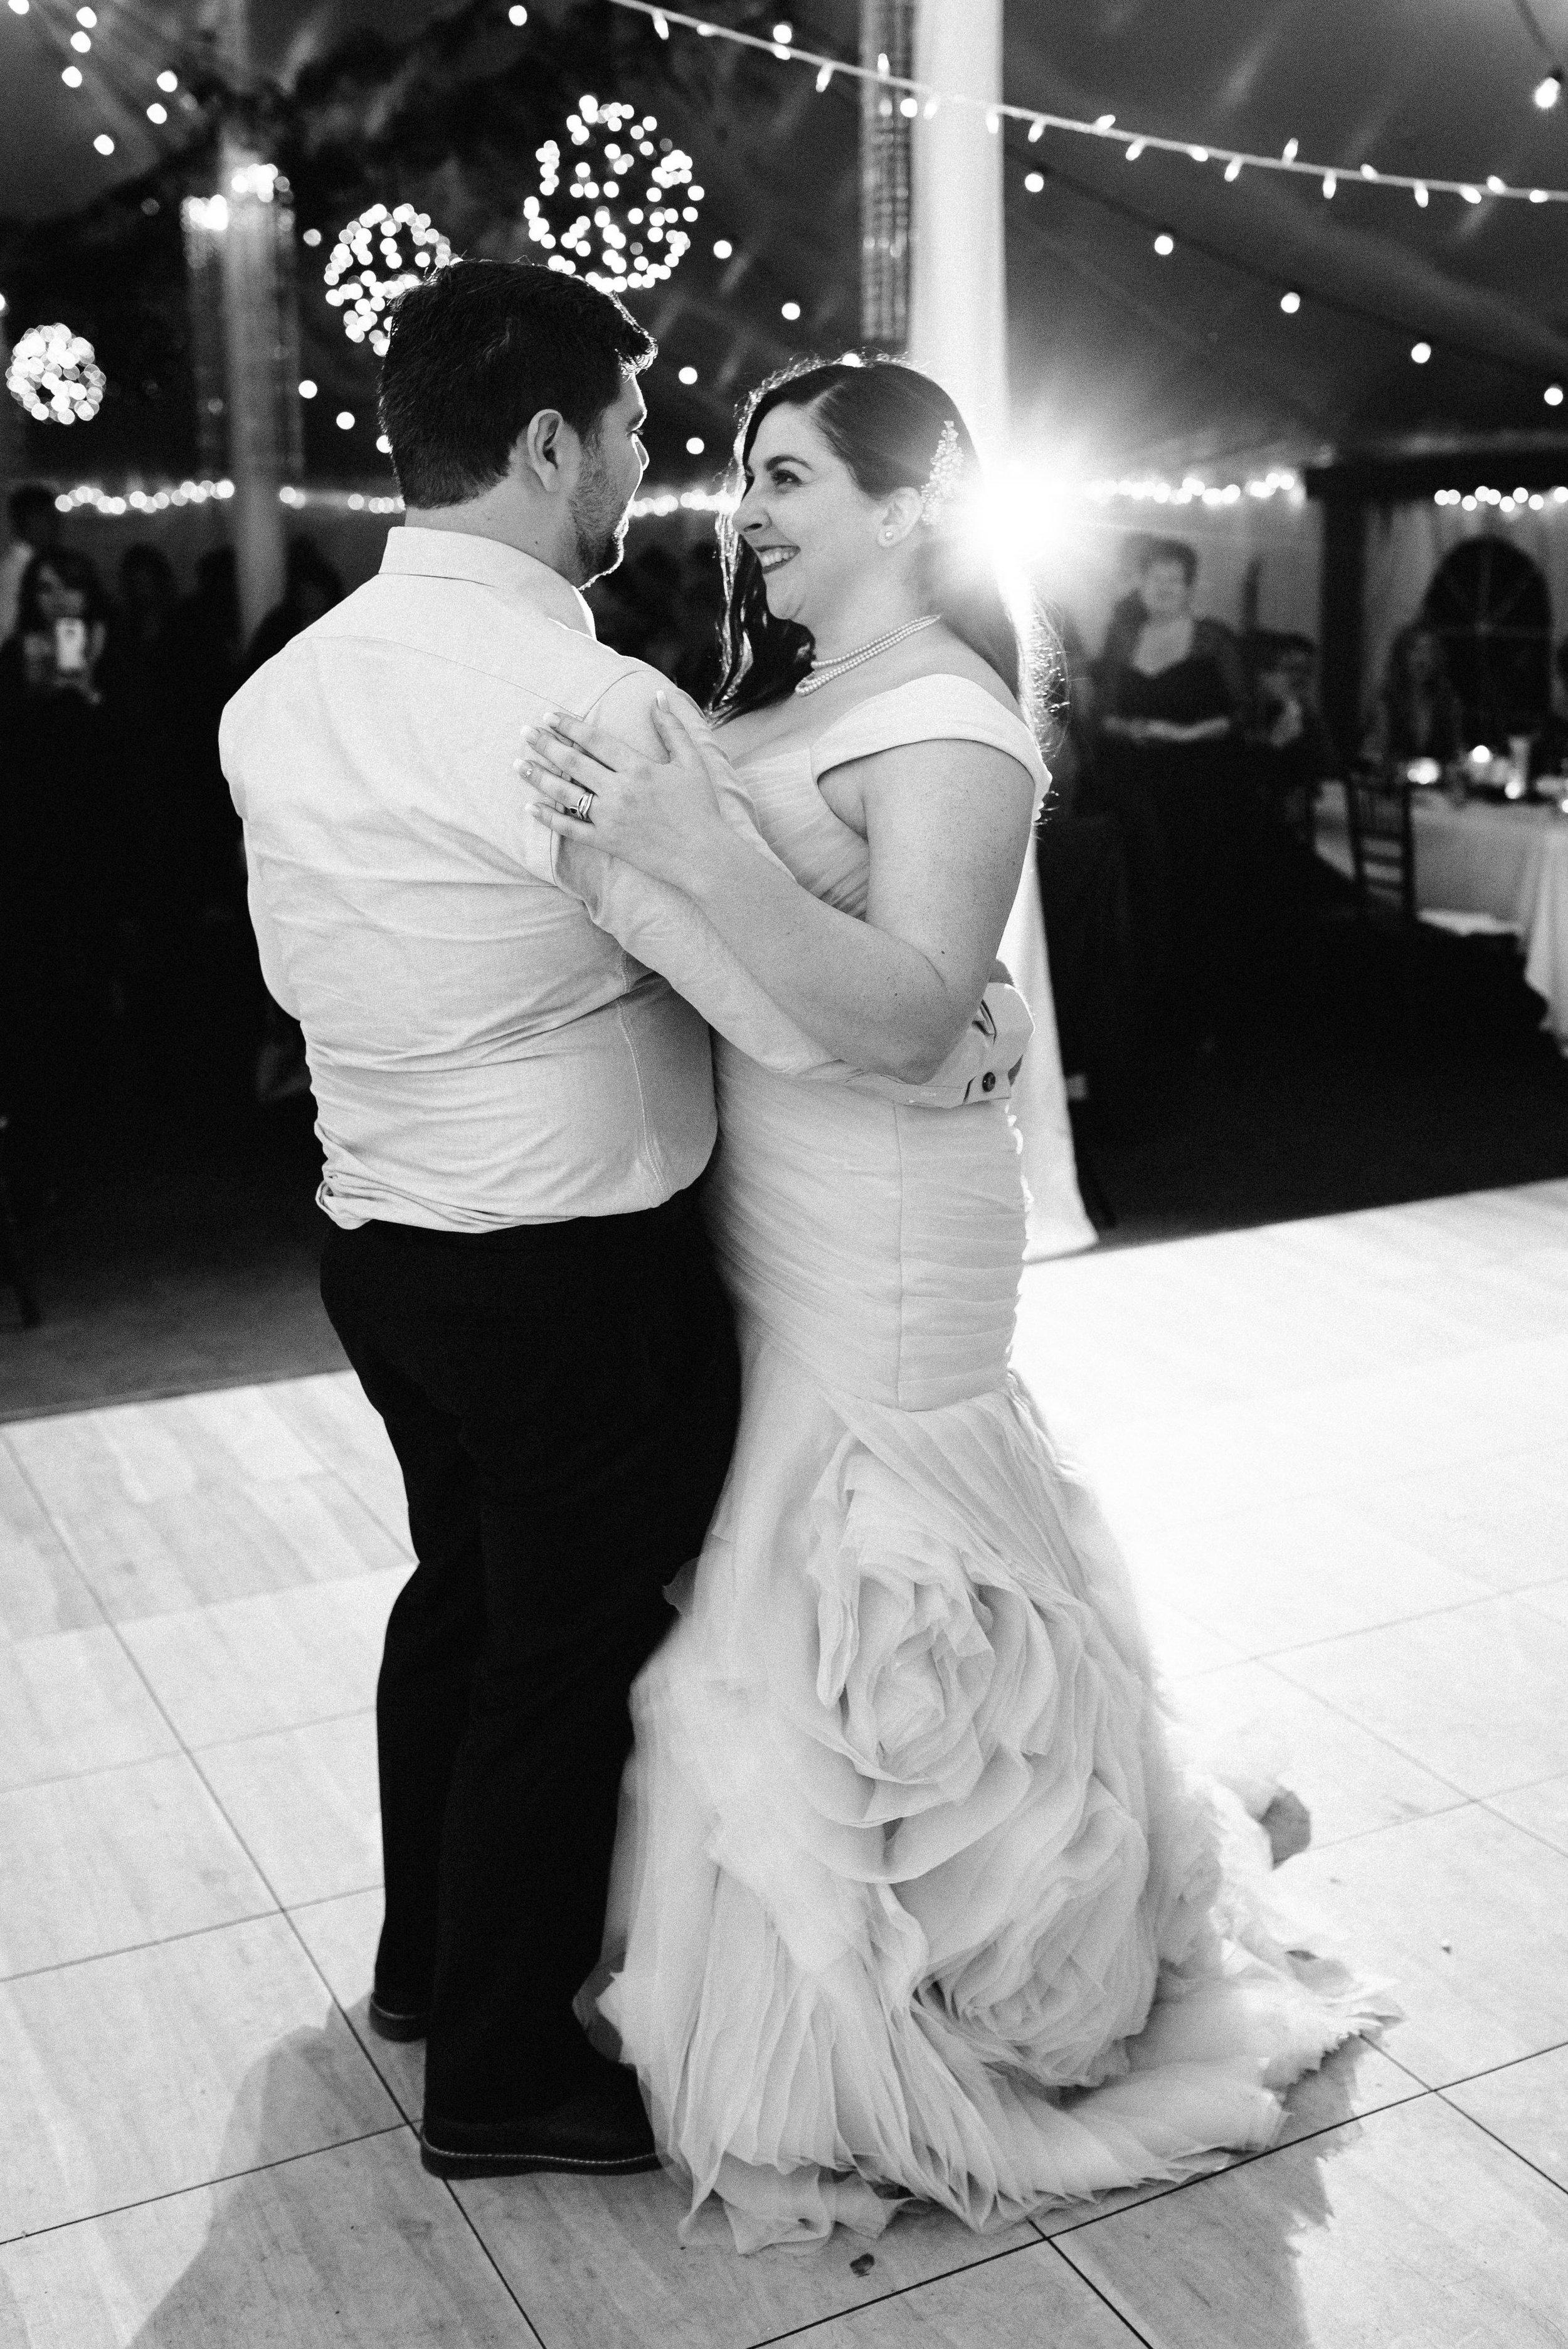 Winnipeg Wedding Photographer - Wedding Ideas in Winnipeg